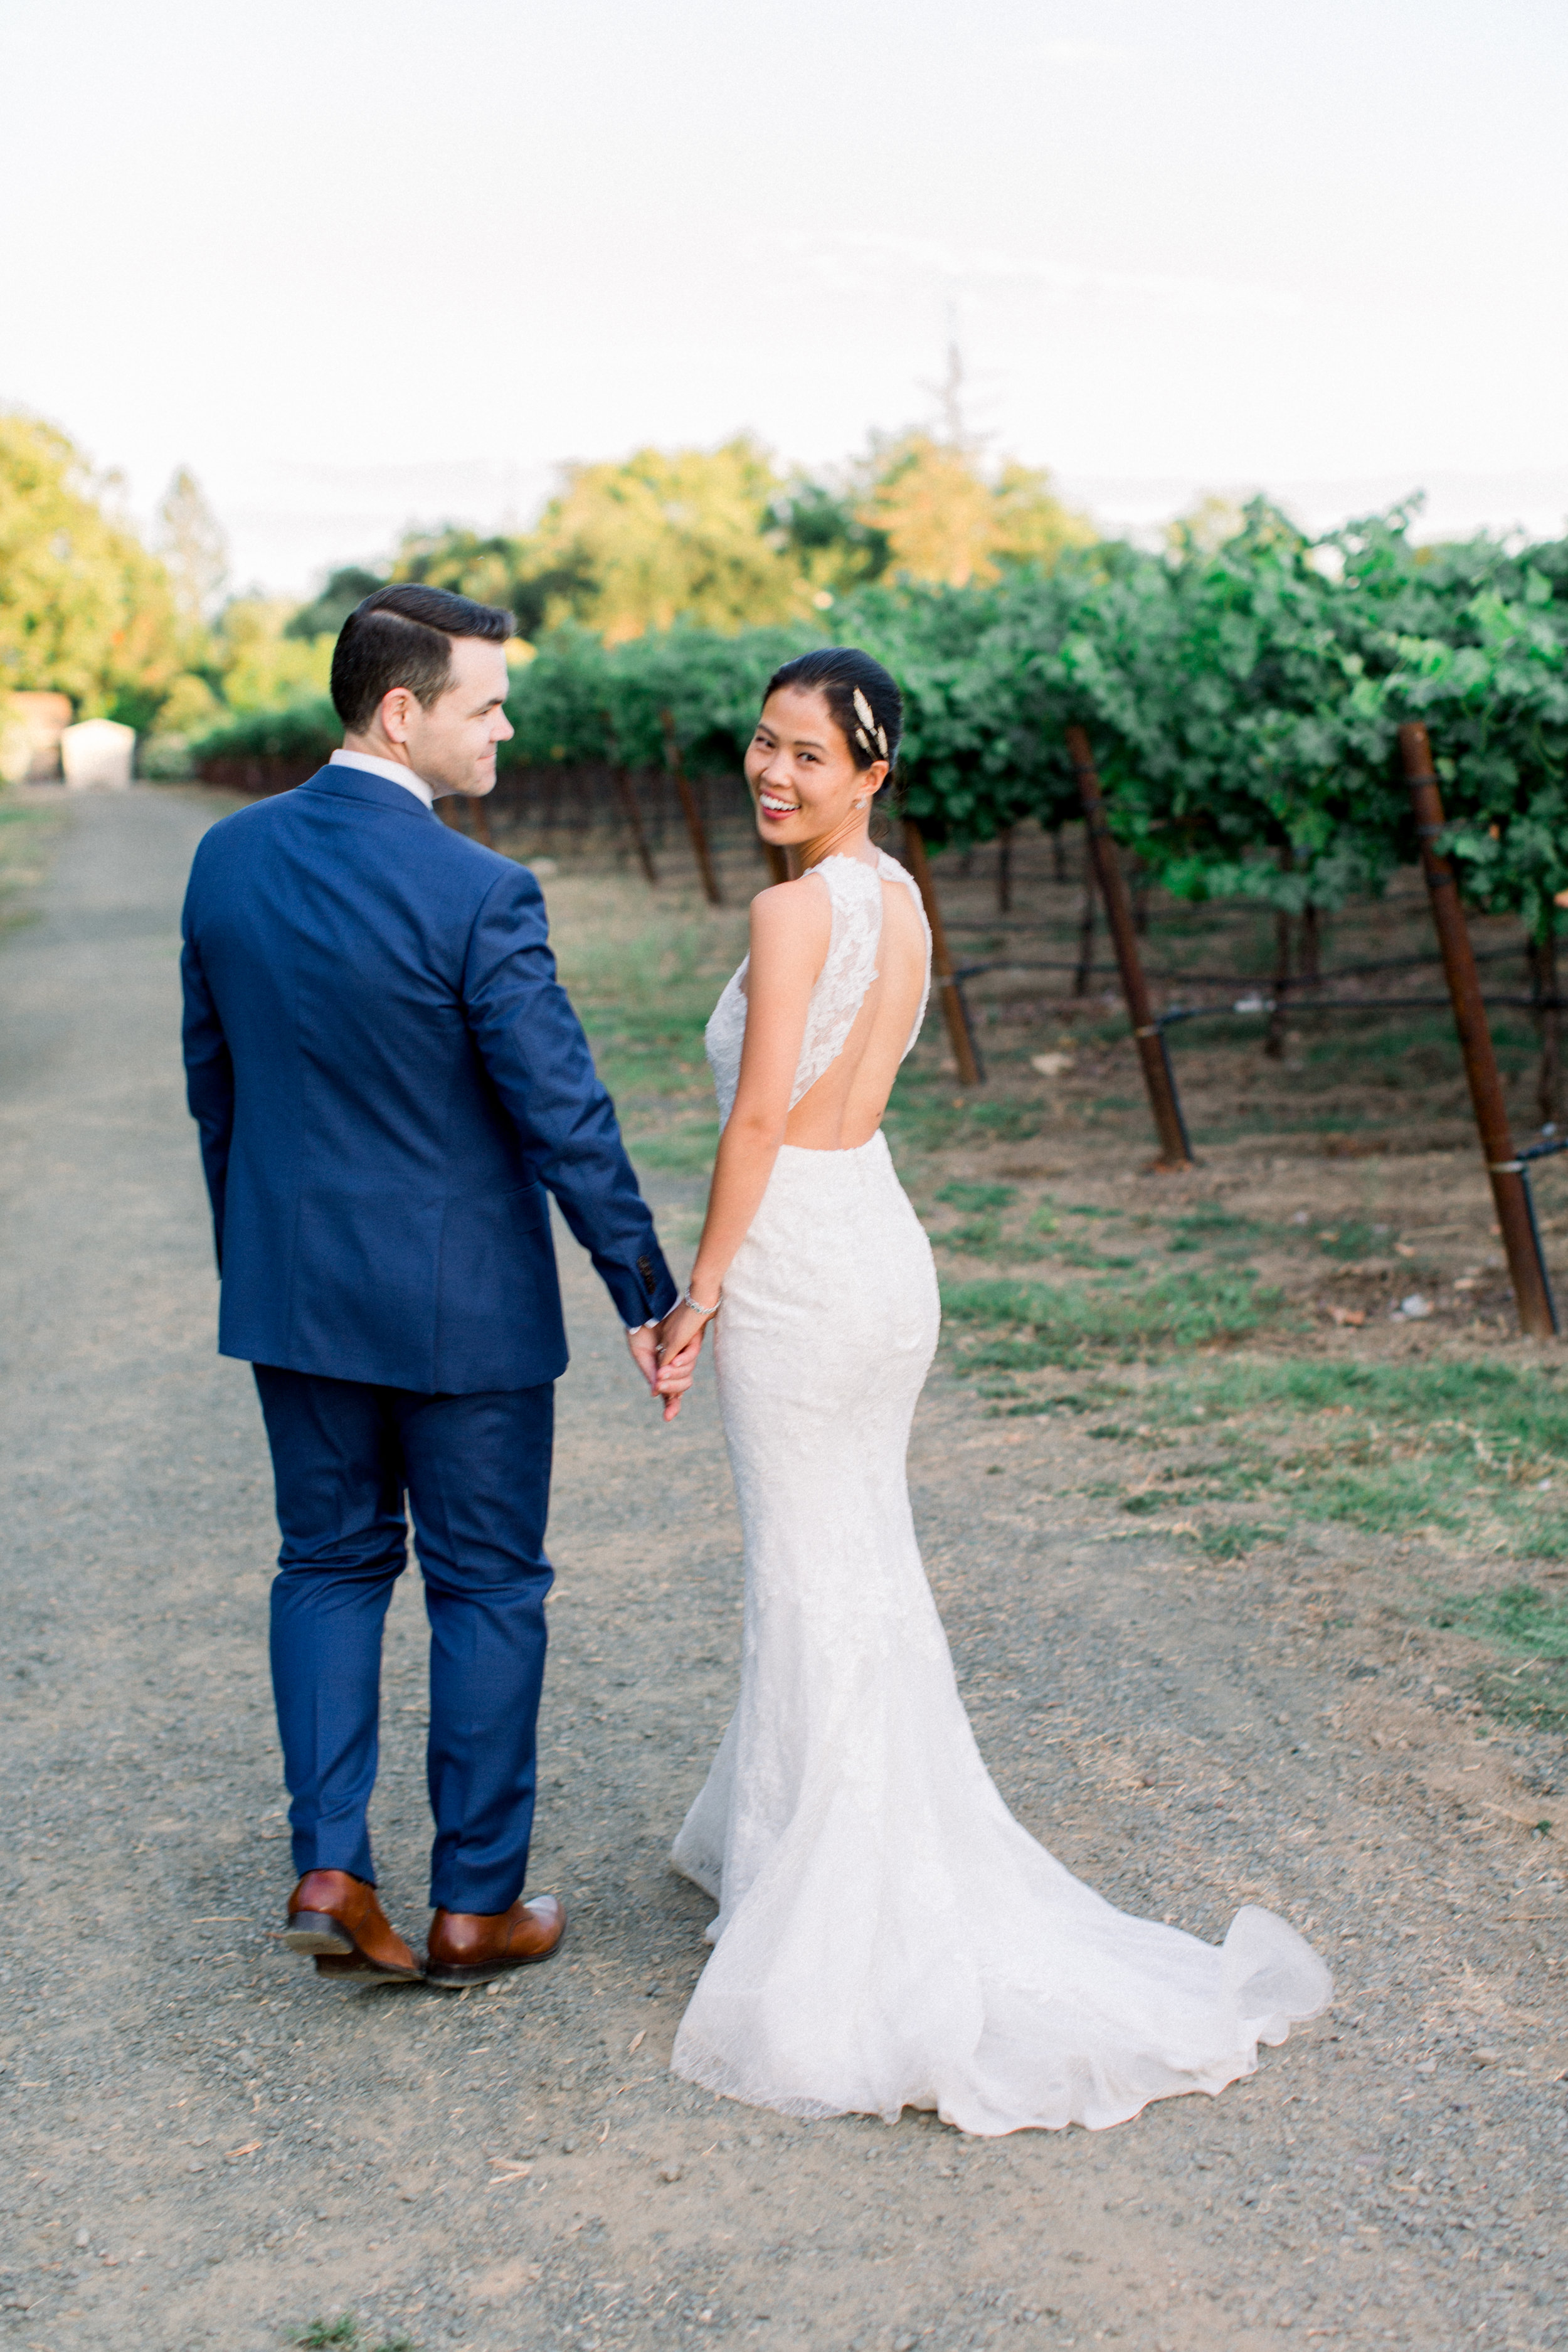 Harvest-inn-wedding-in-napa-california-322.jpg